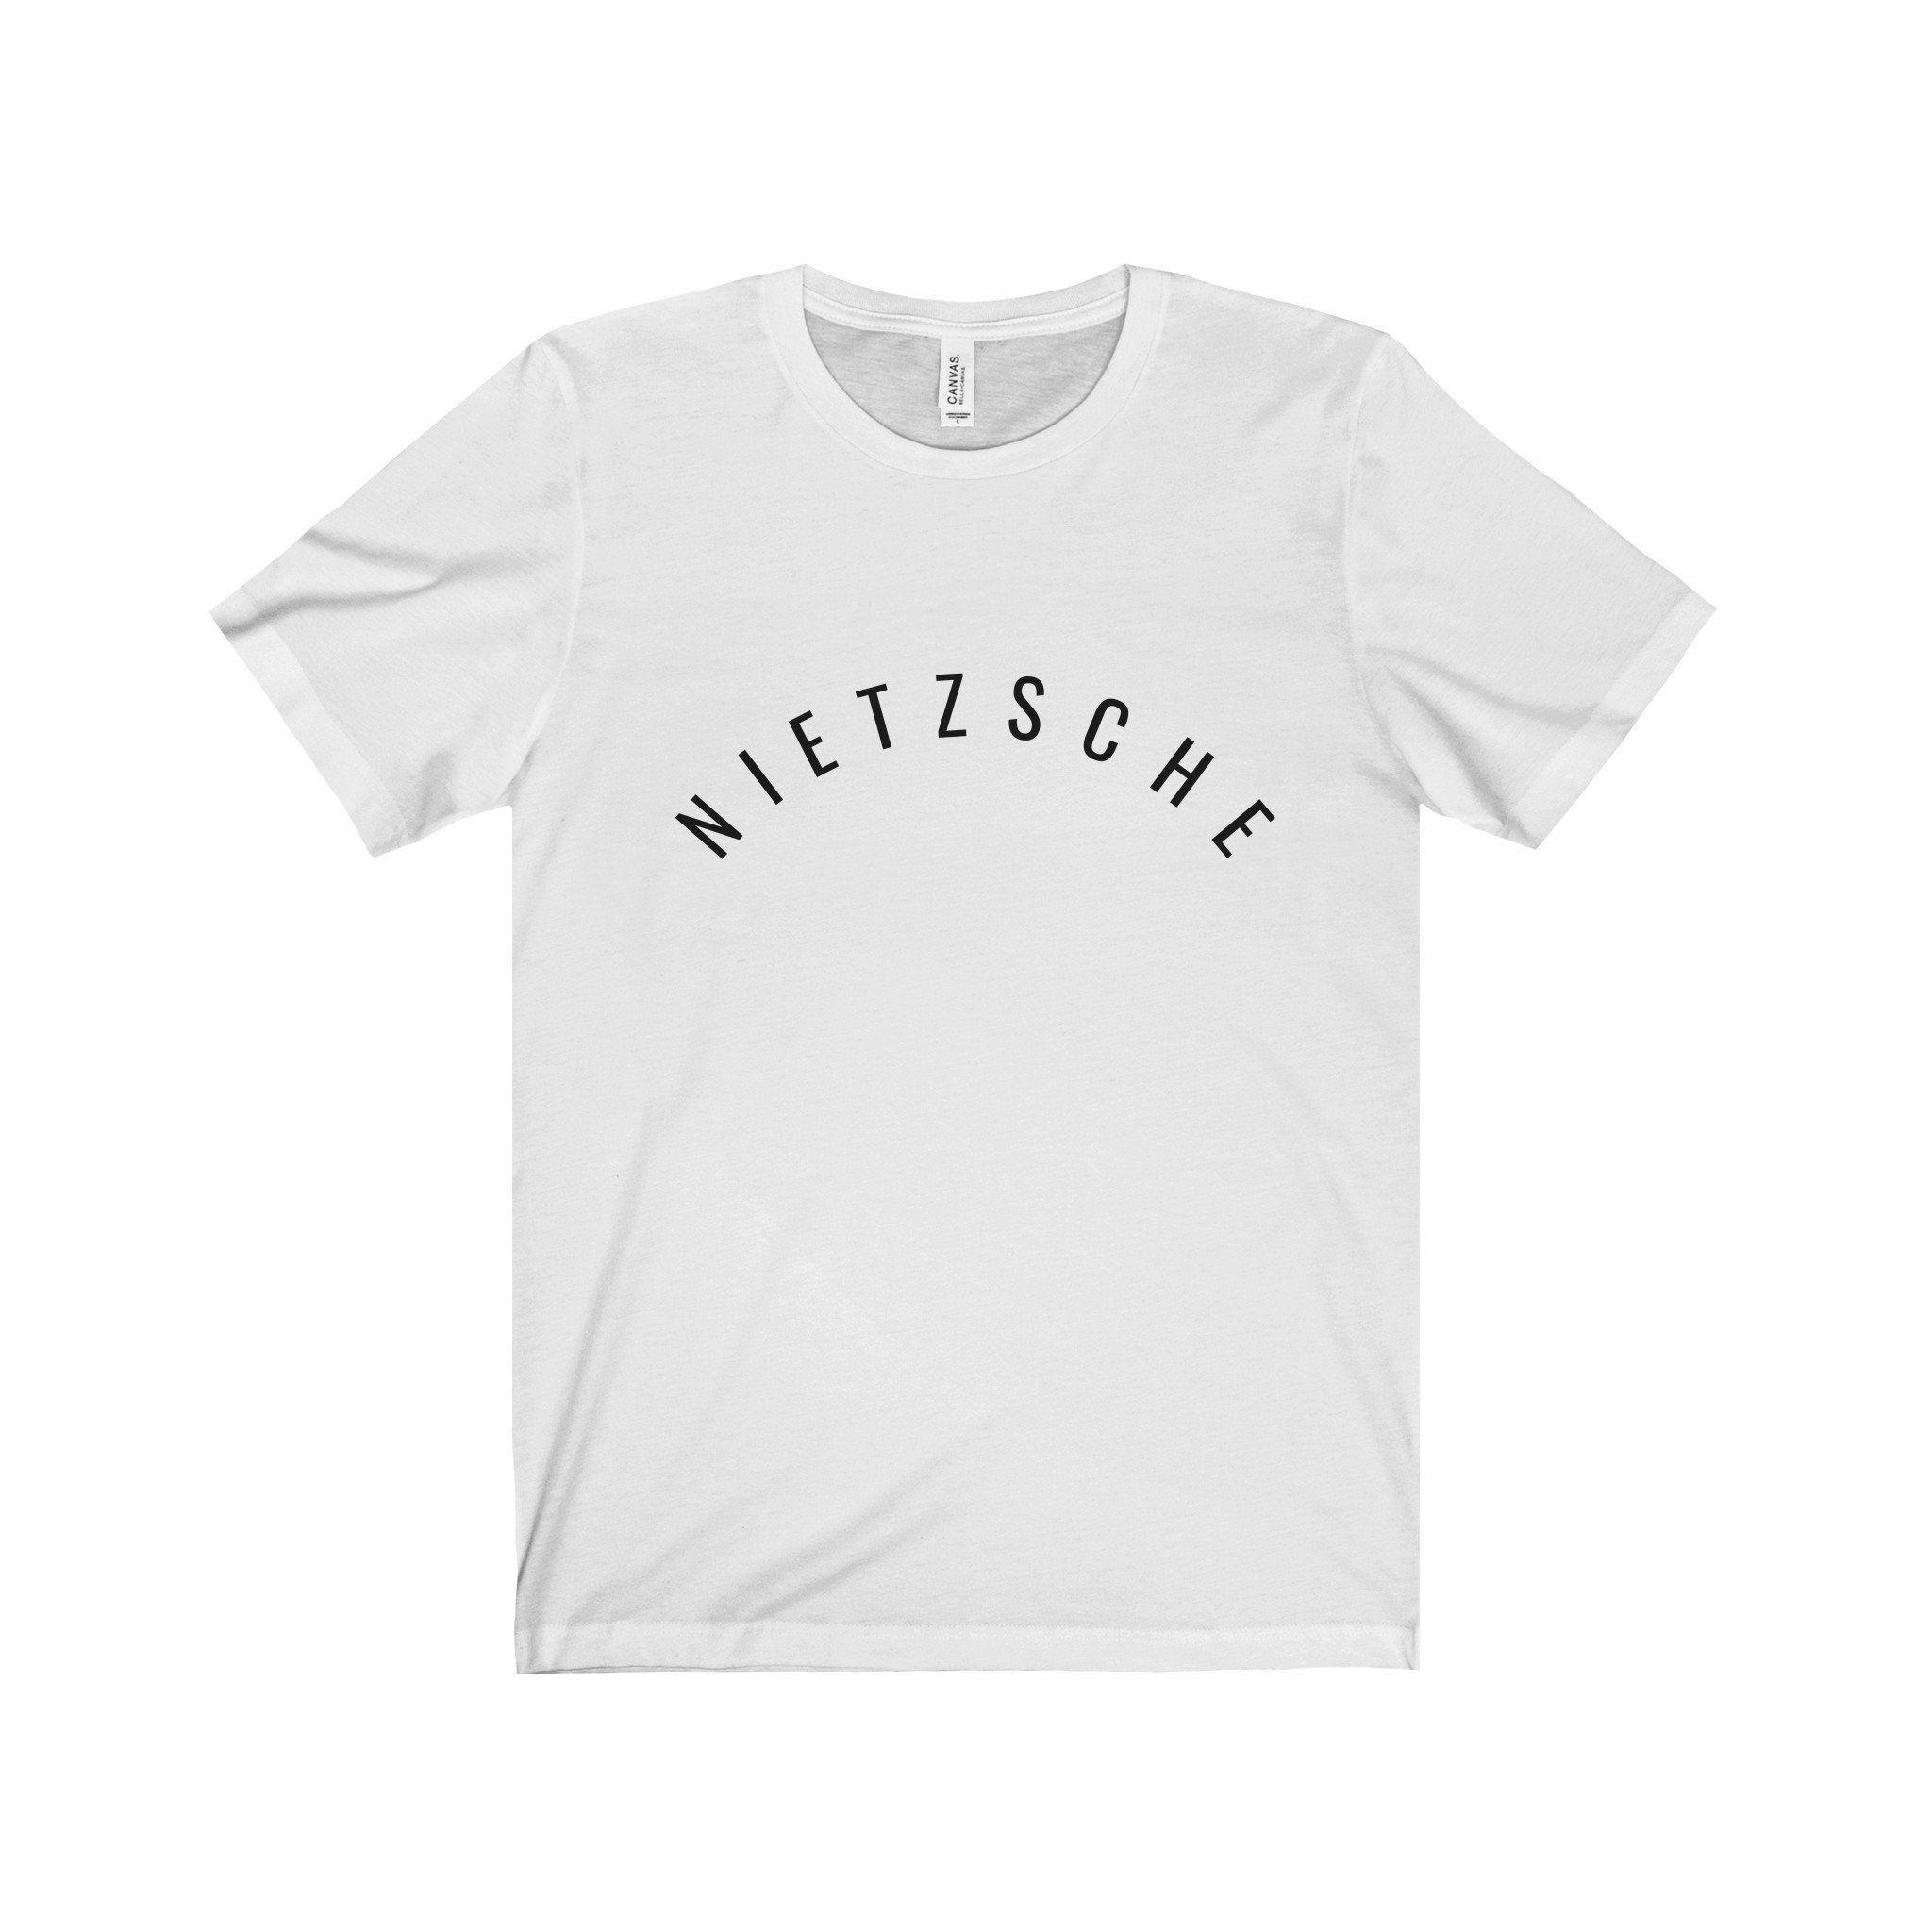 Nietzsche Black Letter Tee 5 Colors Available Short Sleeve Tee